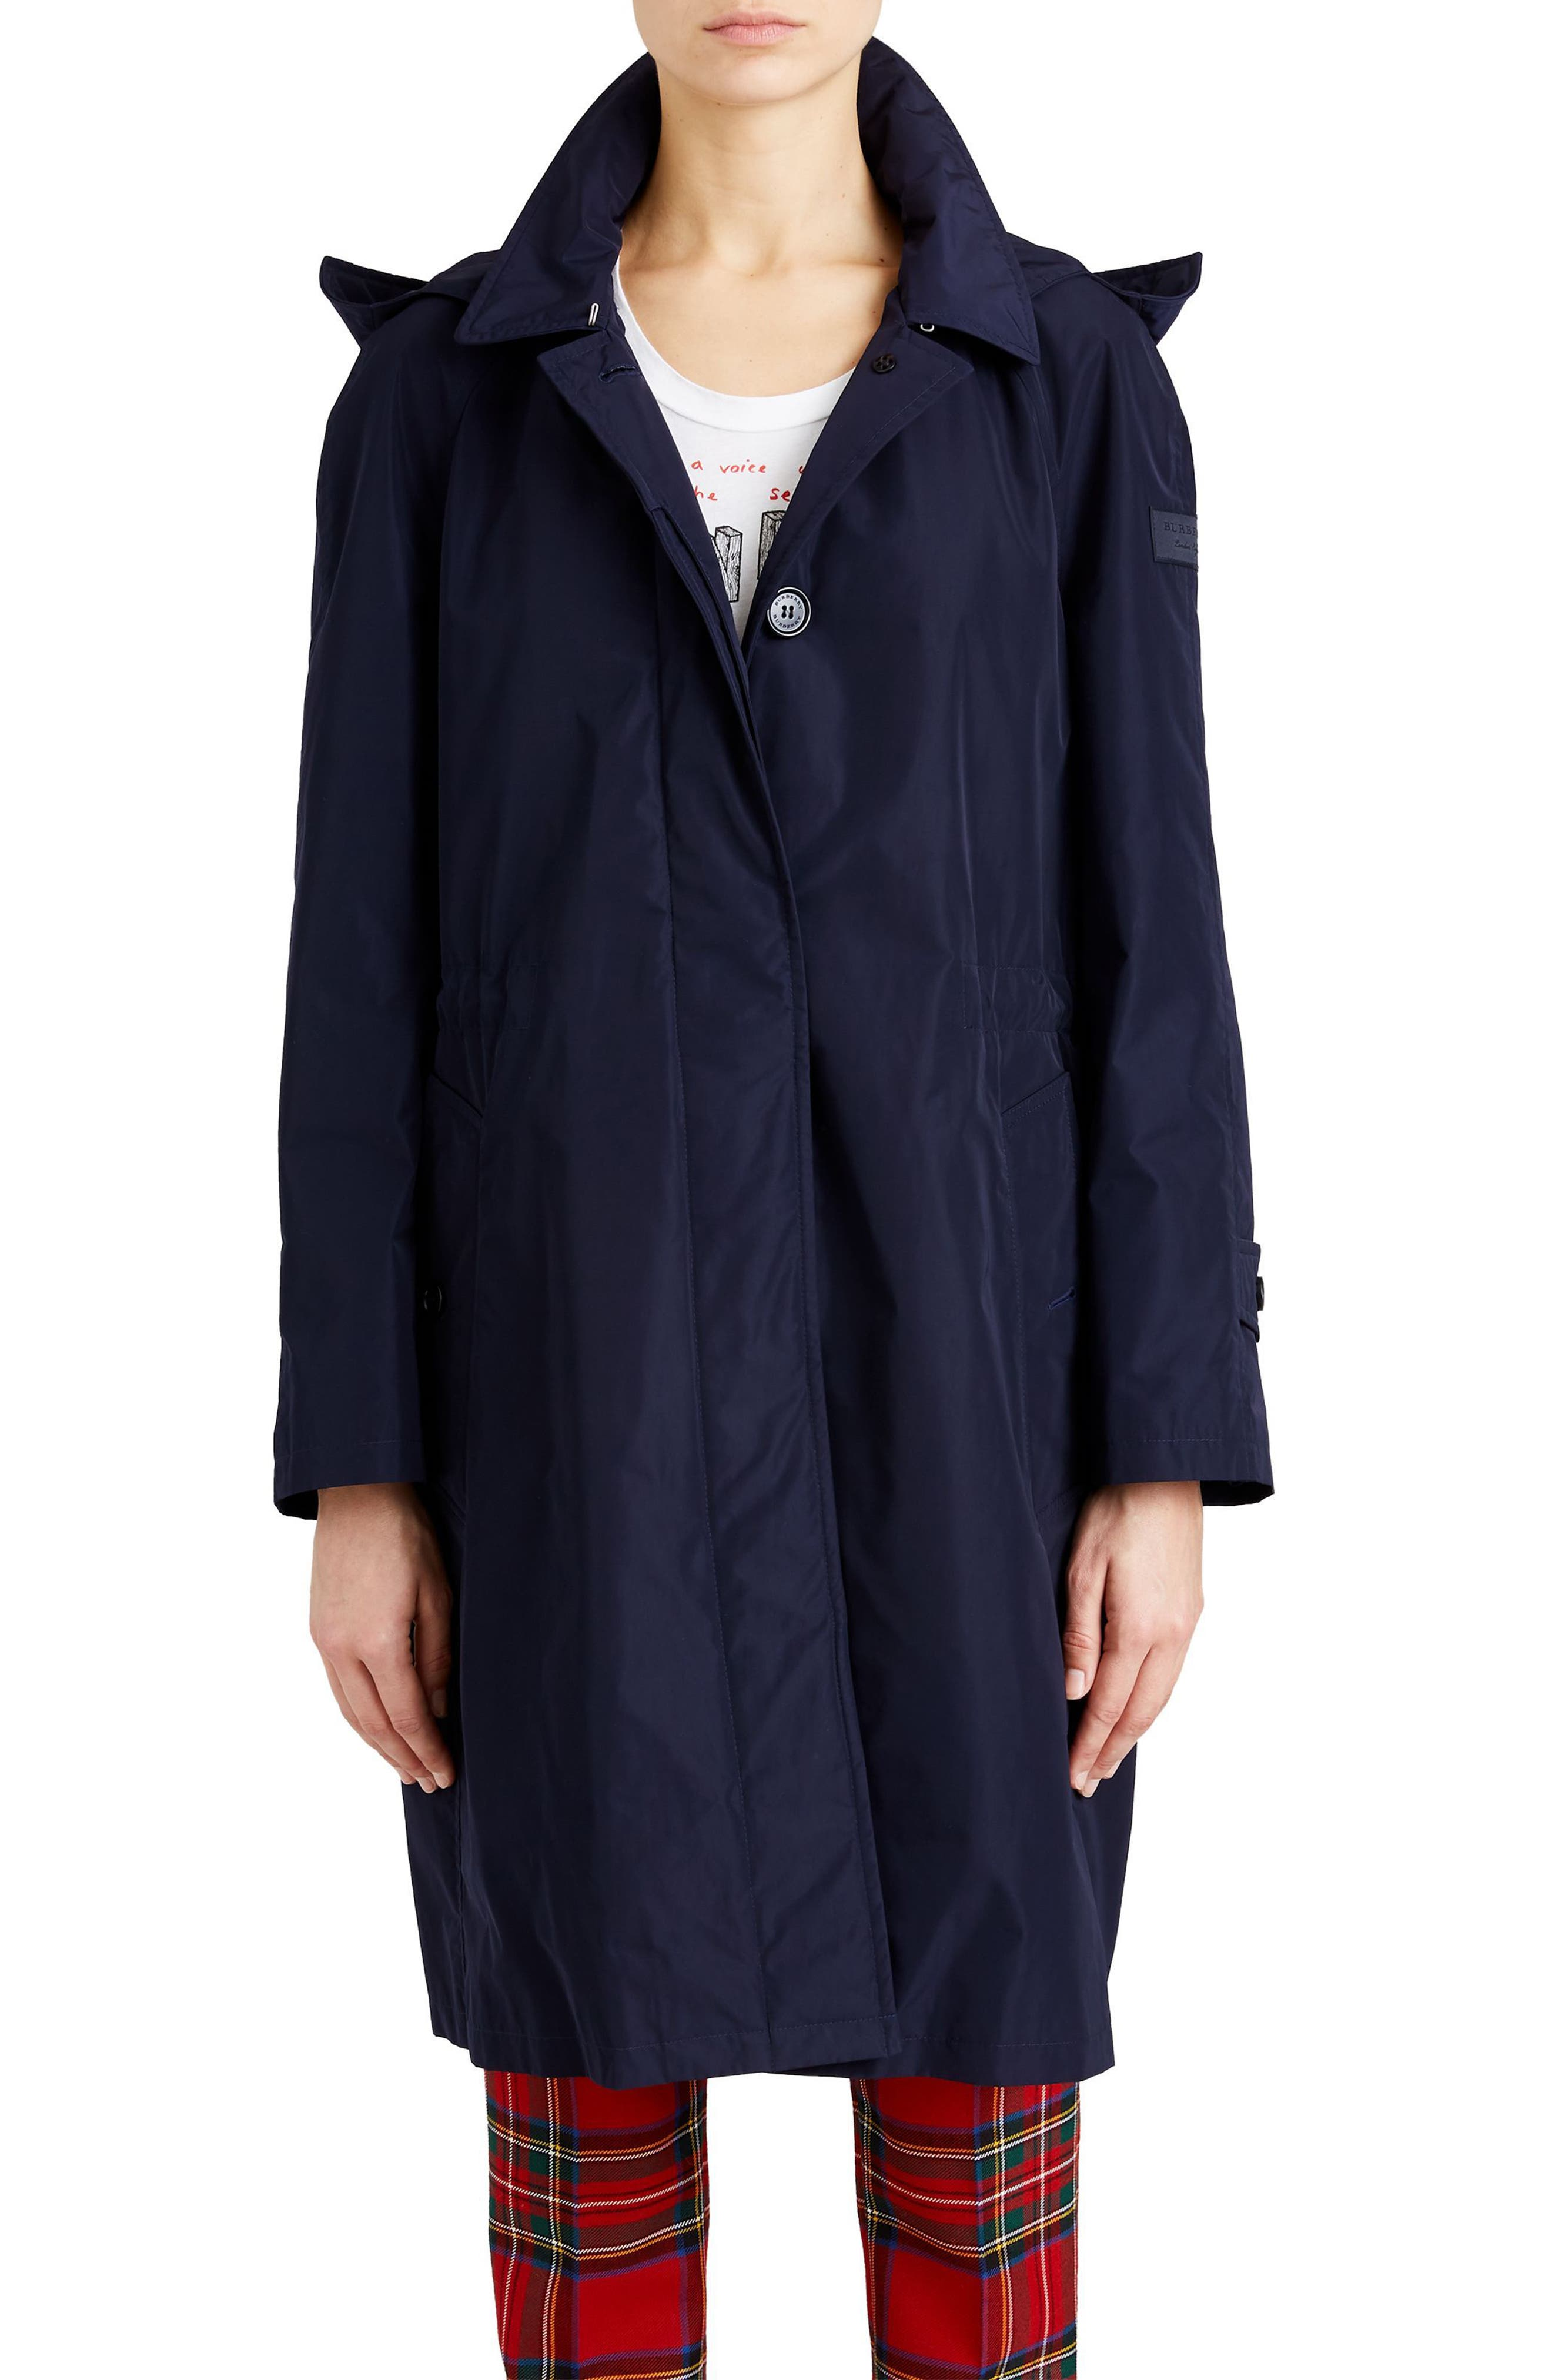 Tringford Waterproof Hooded Coat,                             Main thumbnail 1, color,                             Navy